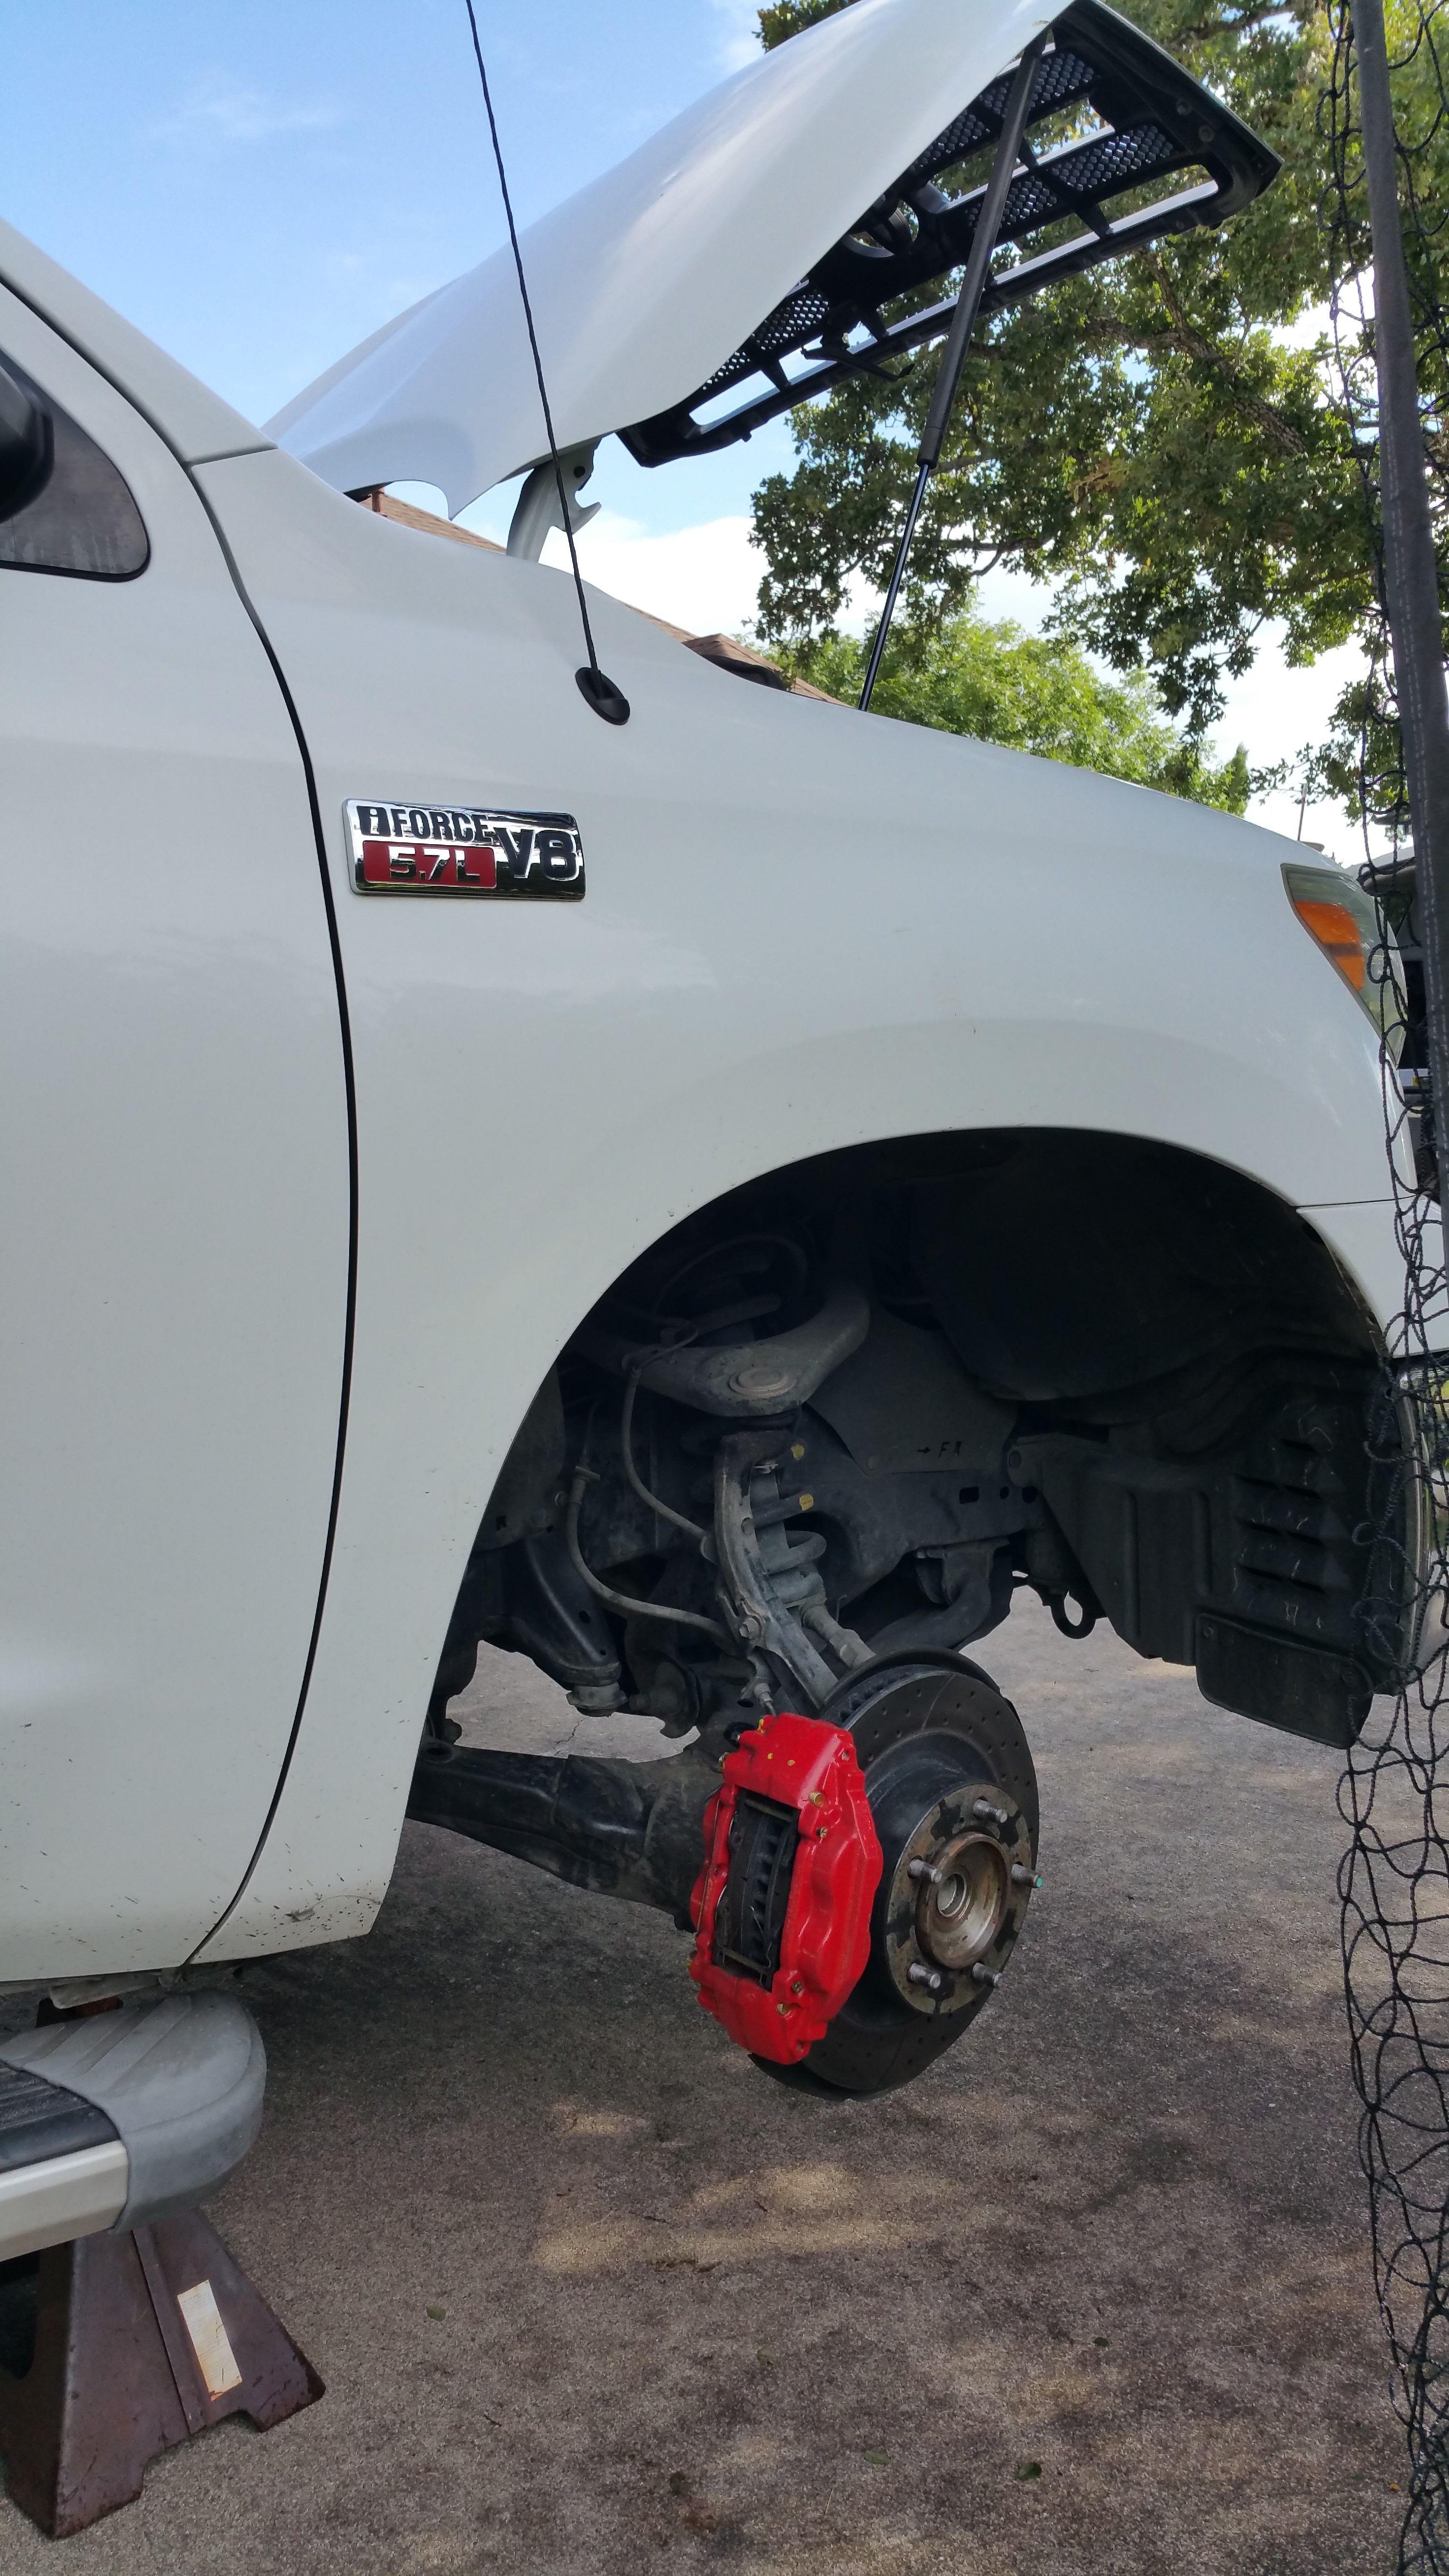 Diy Thanks To Https Www Puretundra Com Brake Pads And Rotors Tundra Accessories Black Rhino Wheels